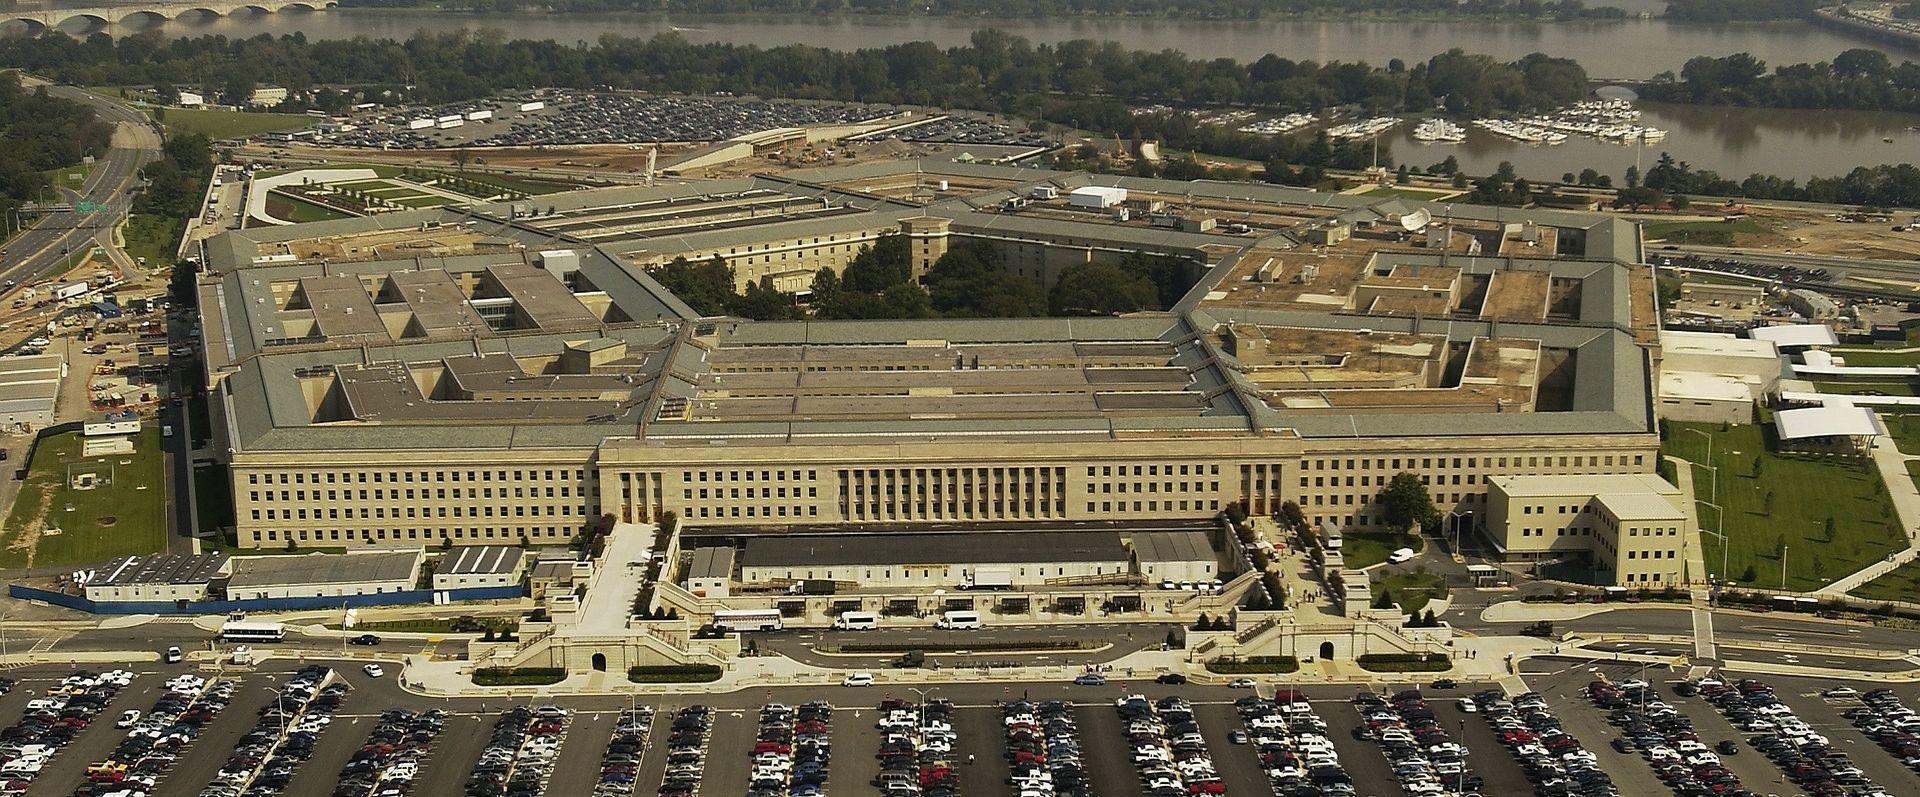 PENTAGON: Al Bagdadi će platiti za svoje zločine